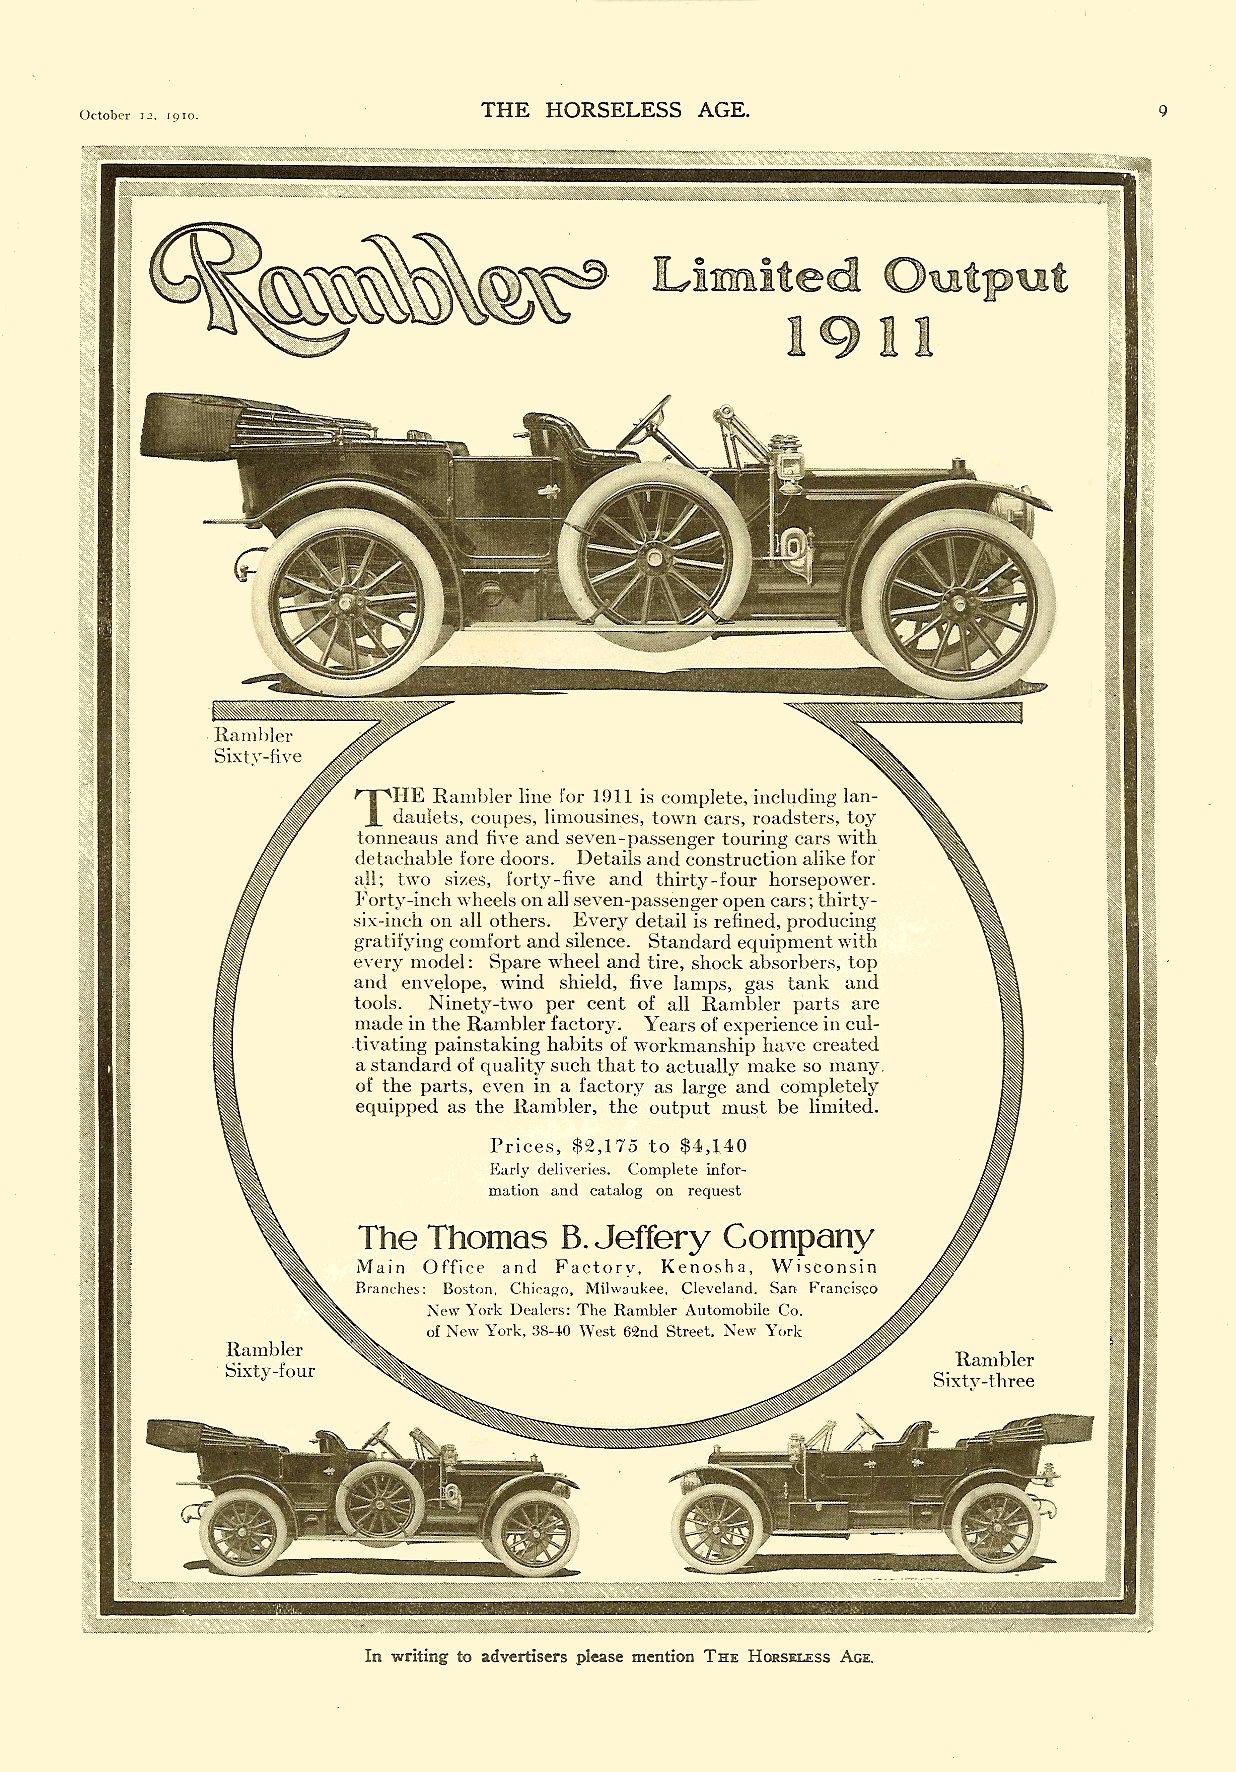 1911 10 12 Rambler – Limited Output The Thomas B. Jeffery Company Kenosha, Wisconsin THE HORSELESS AGE Vol. 26, No. 15 October 12, 1910 9″x12″ page 9